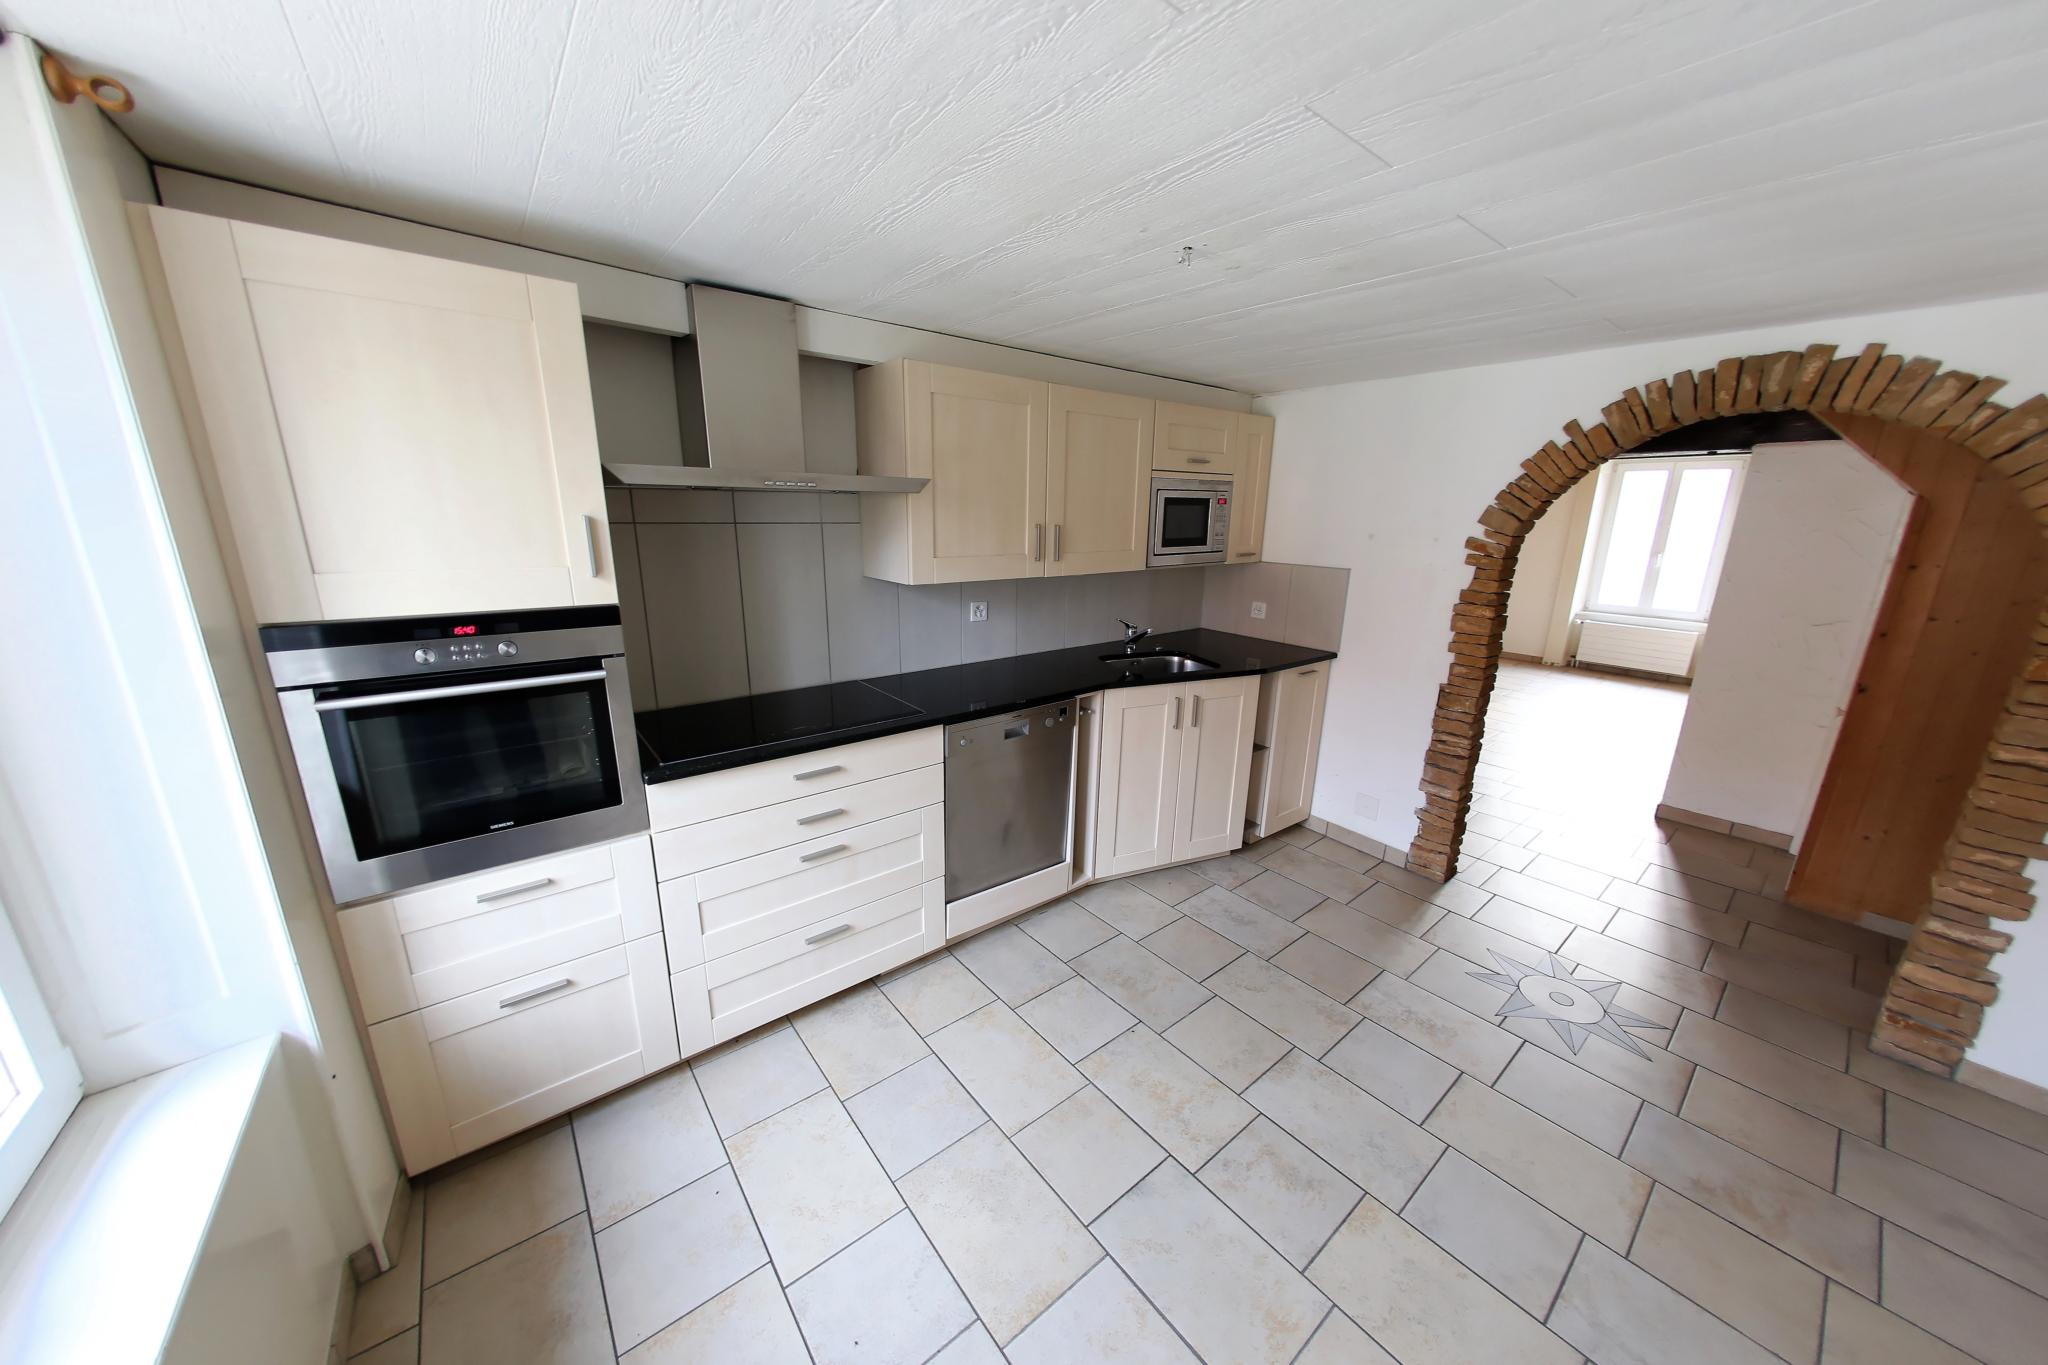 Location: appartement en duplex avec sauna